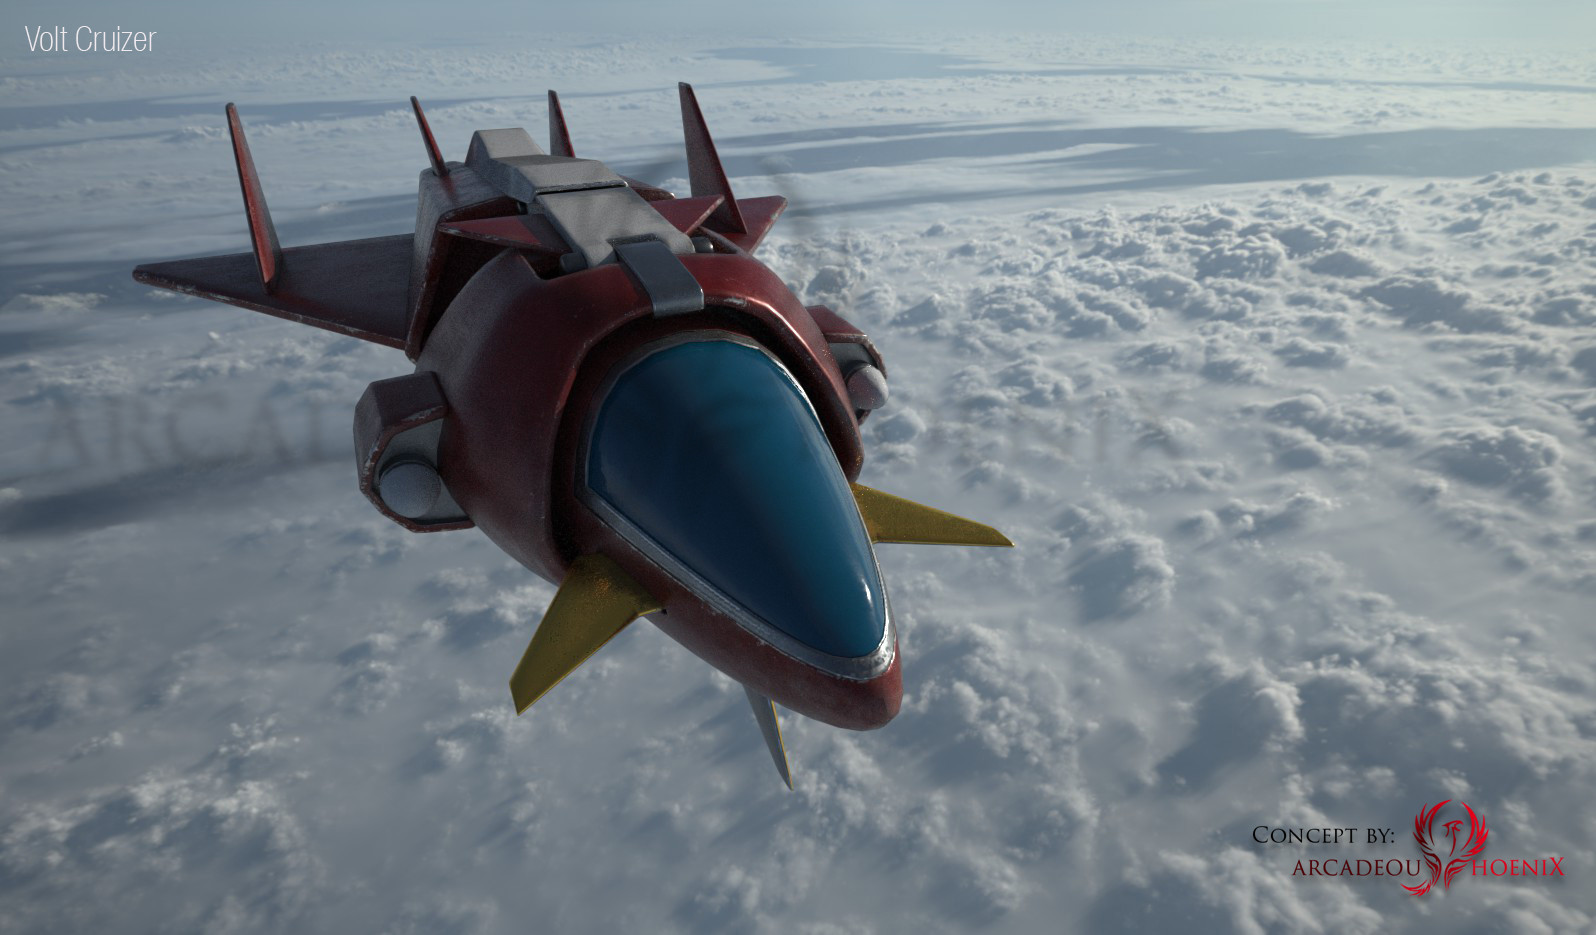 Arcadeous phoenix volt cruiser cam4